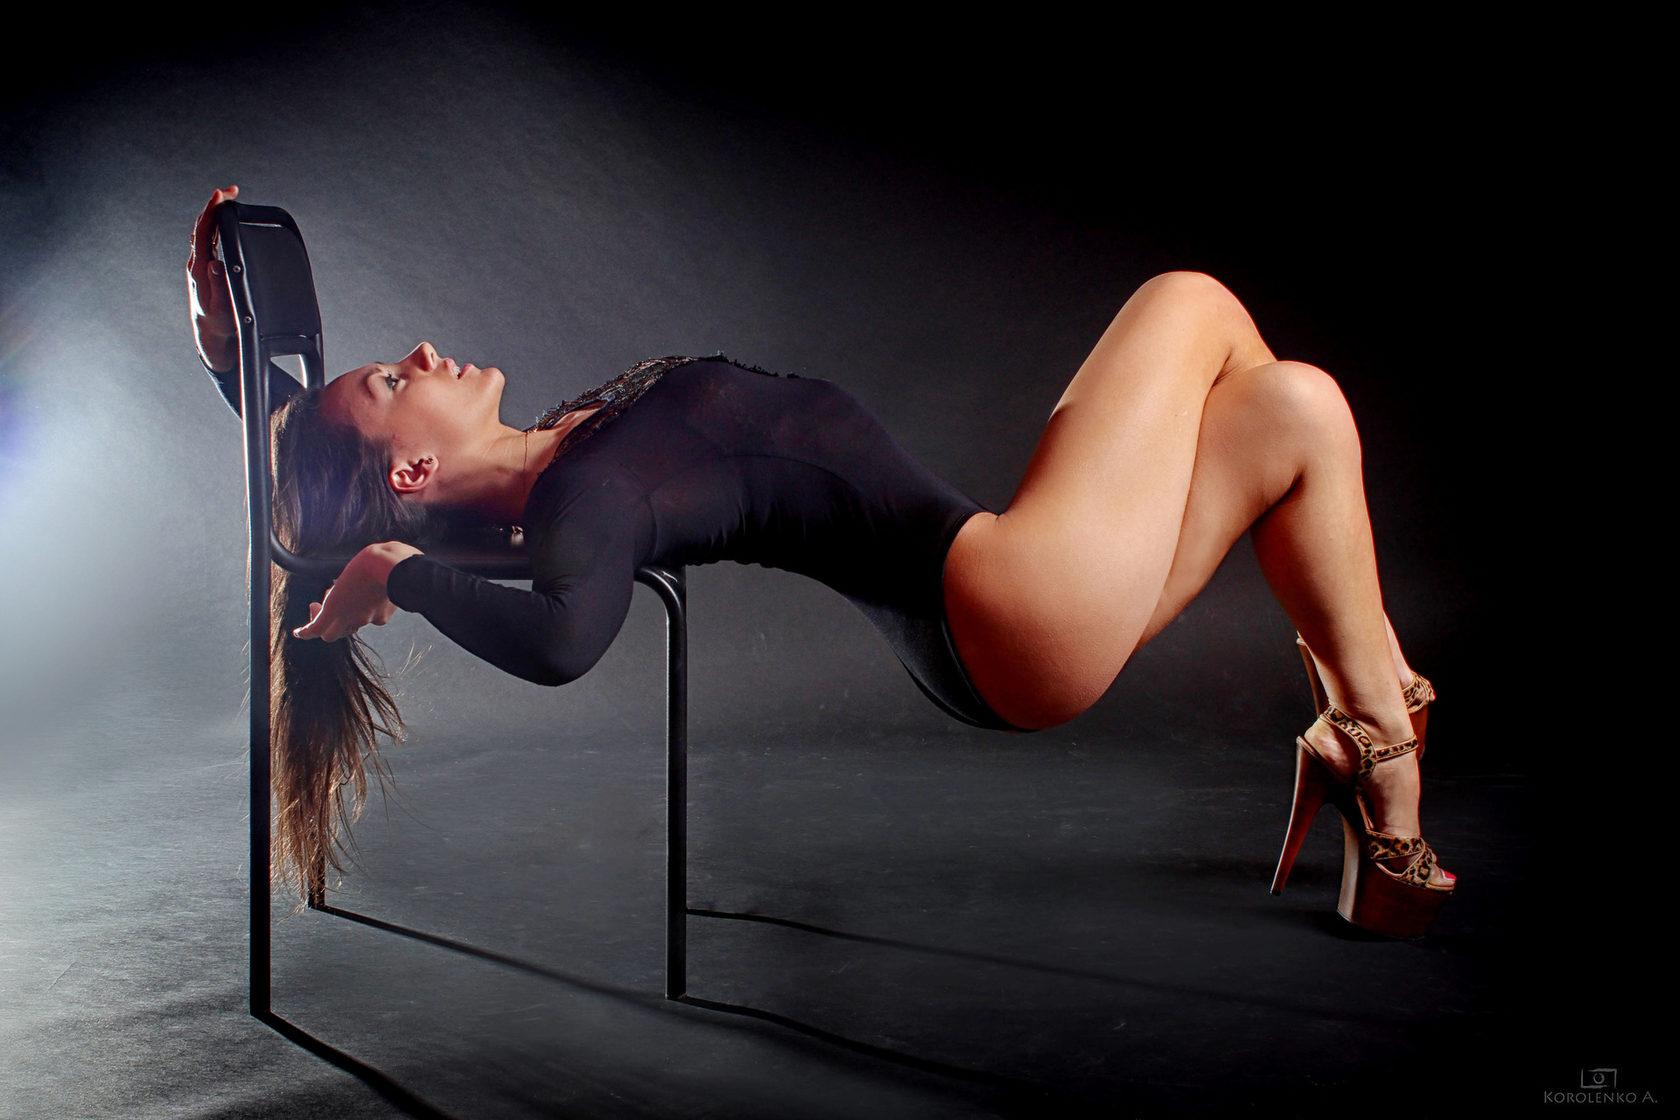 Watch Hot Girl Dance